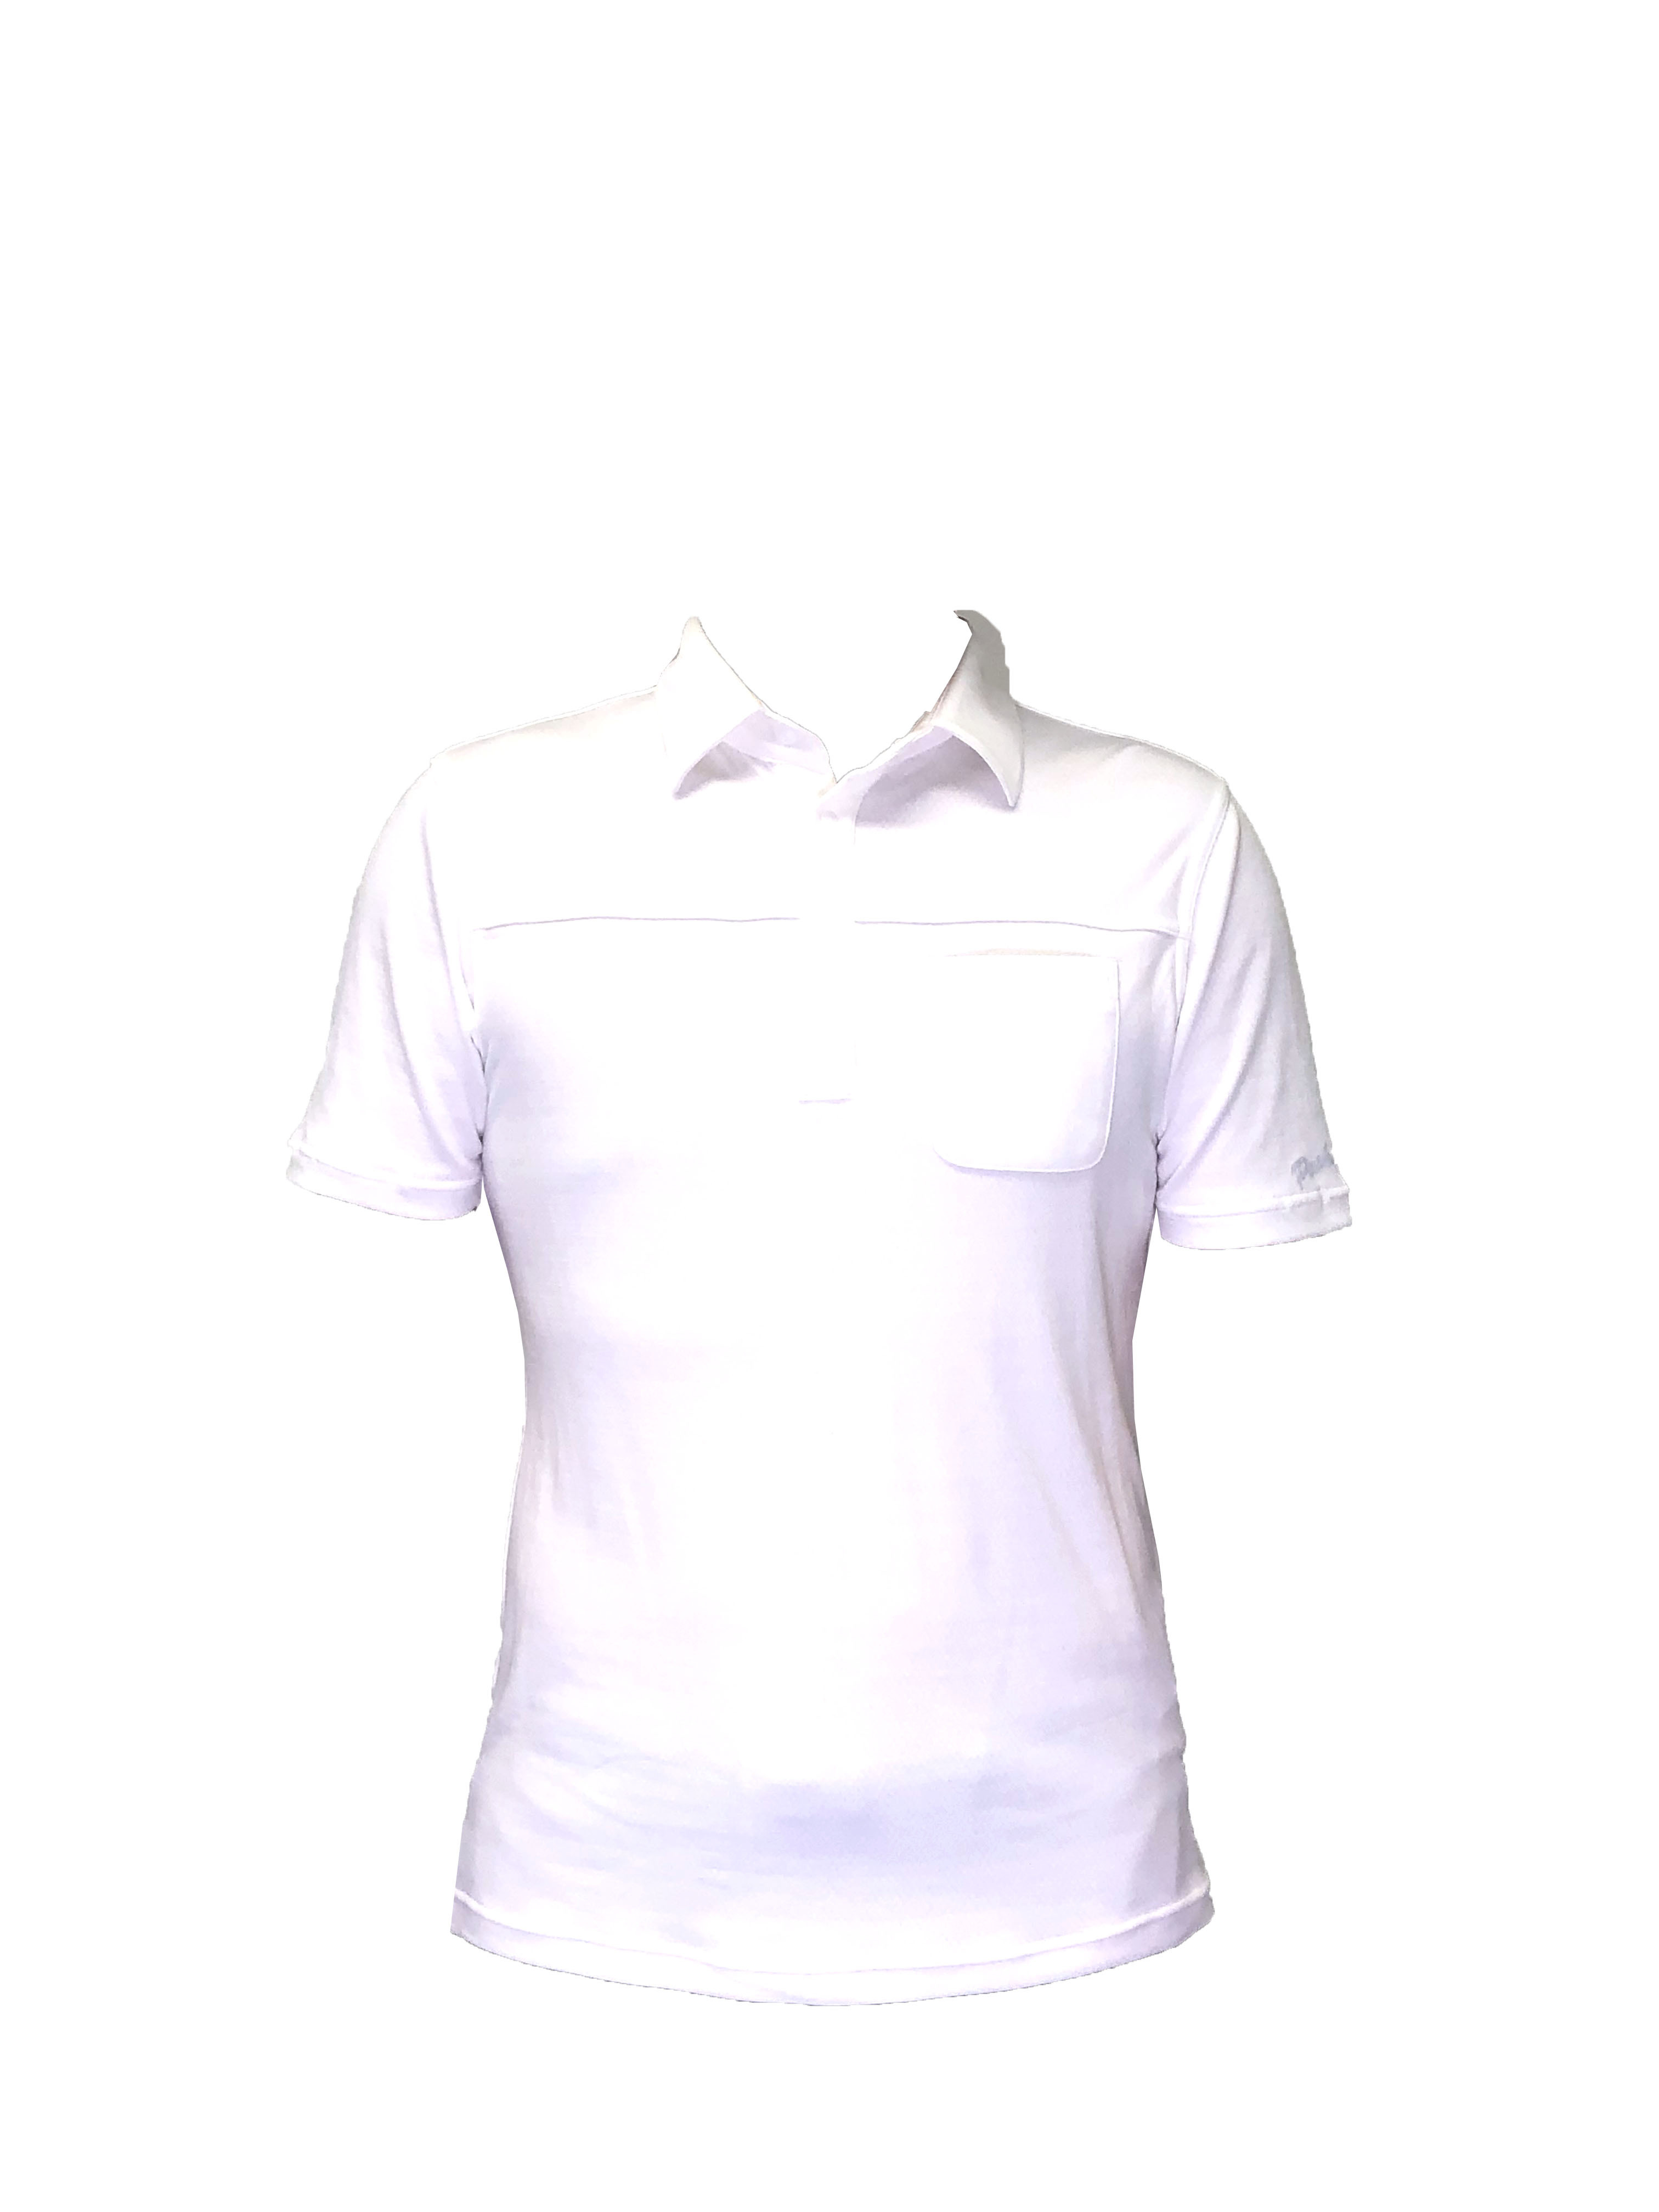 P819SS01 接触冷感 メンズポロシャツ(ホワイト)